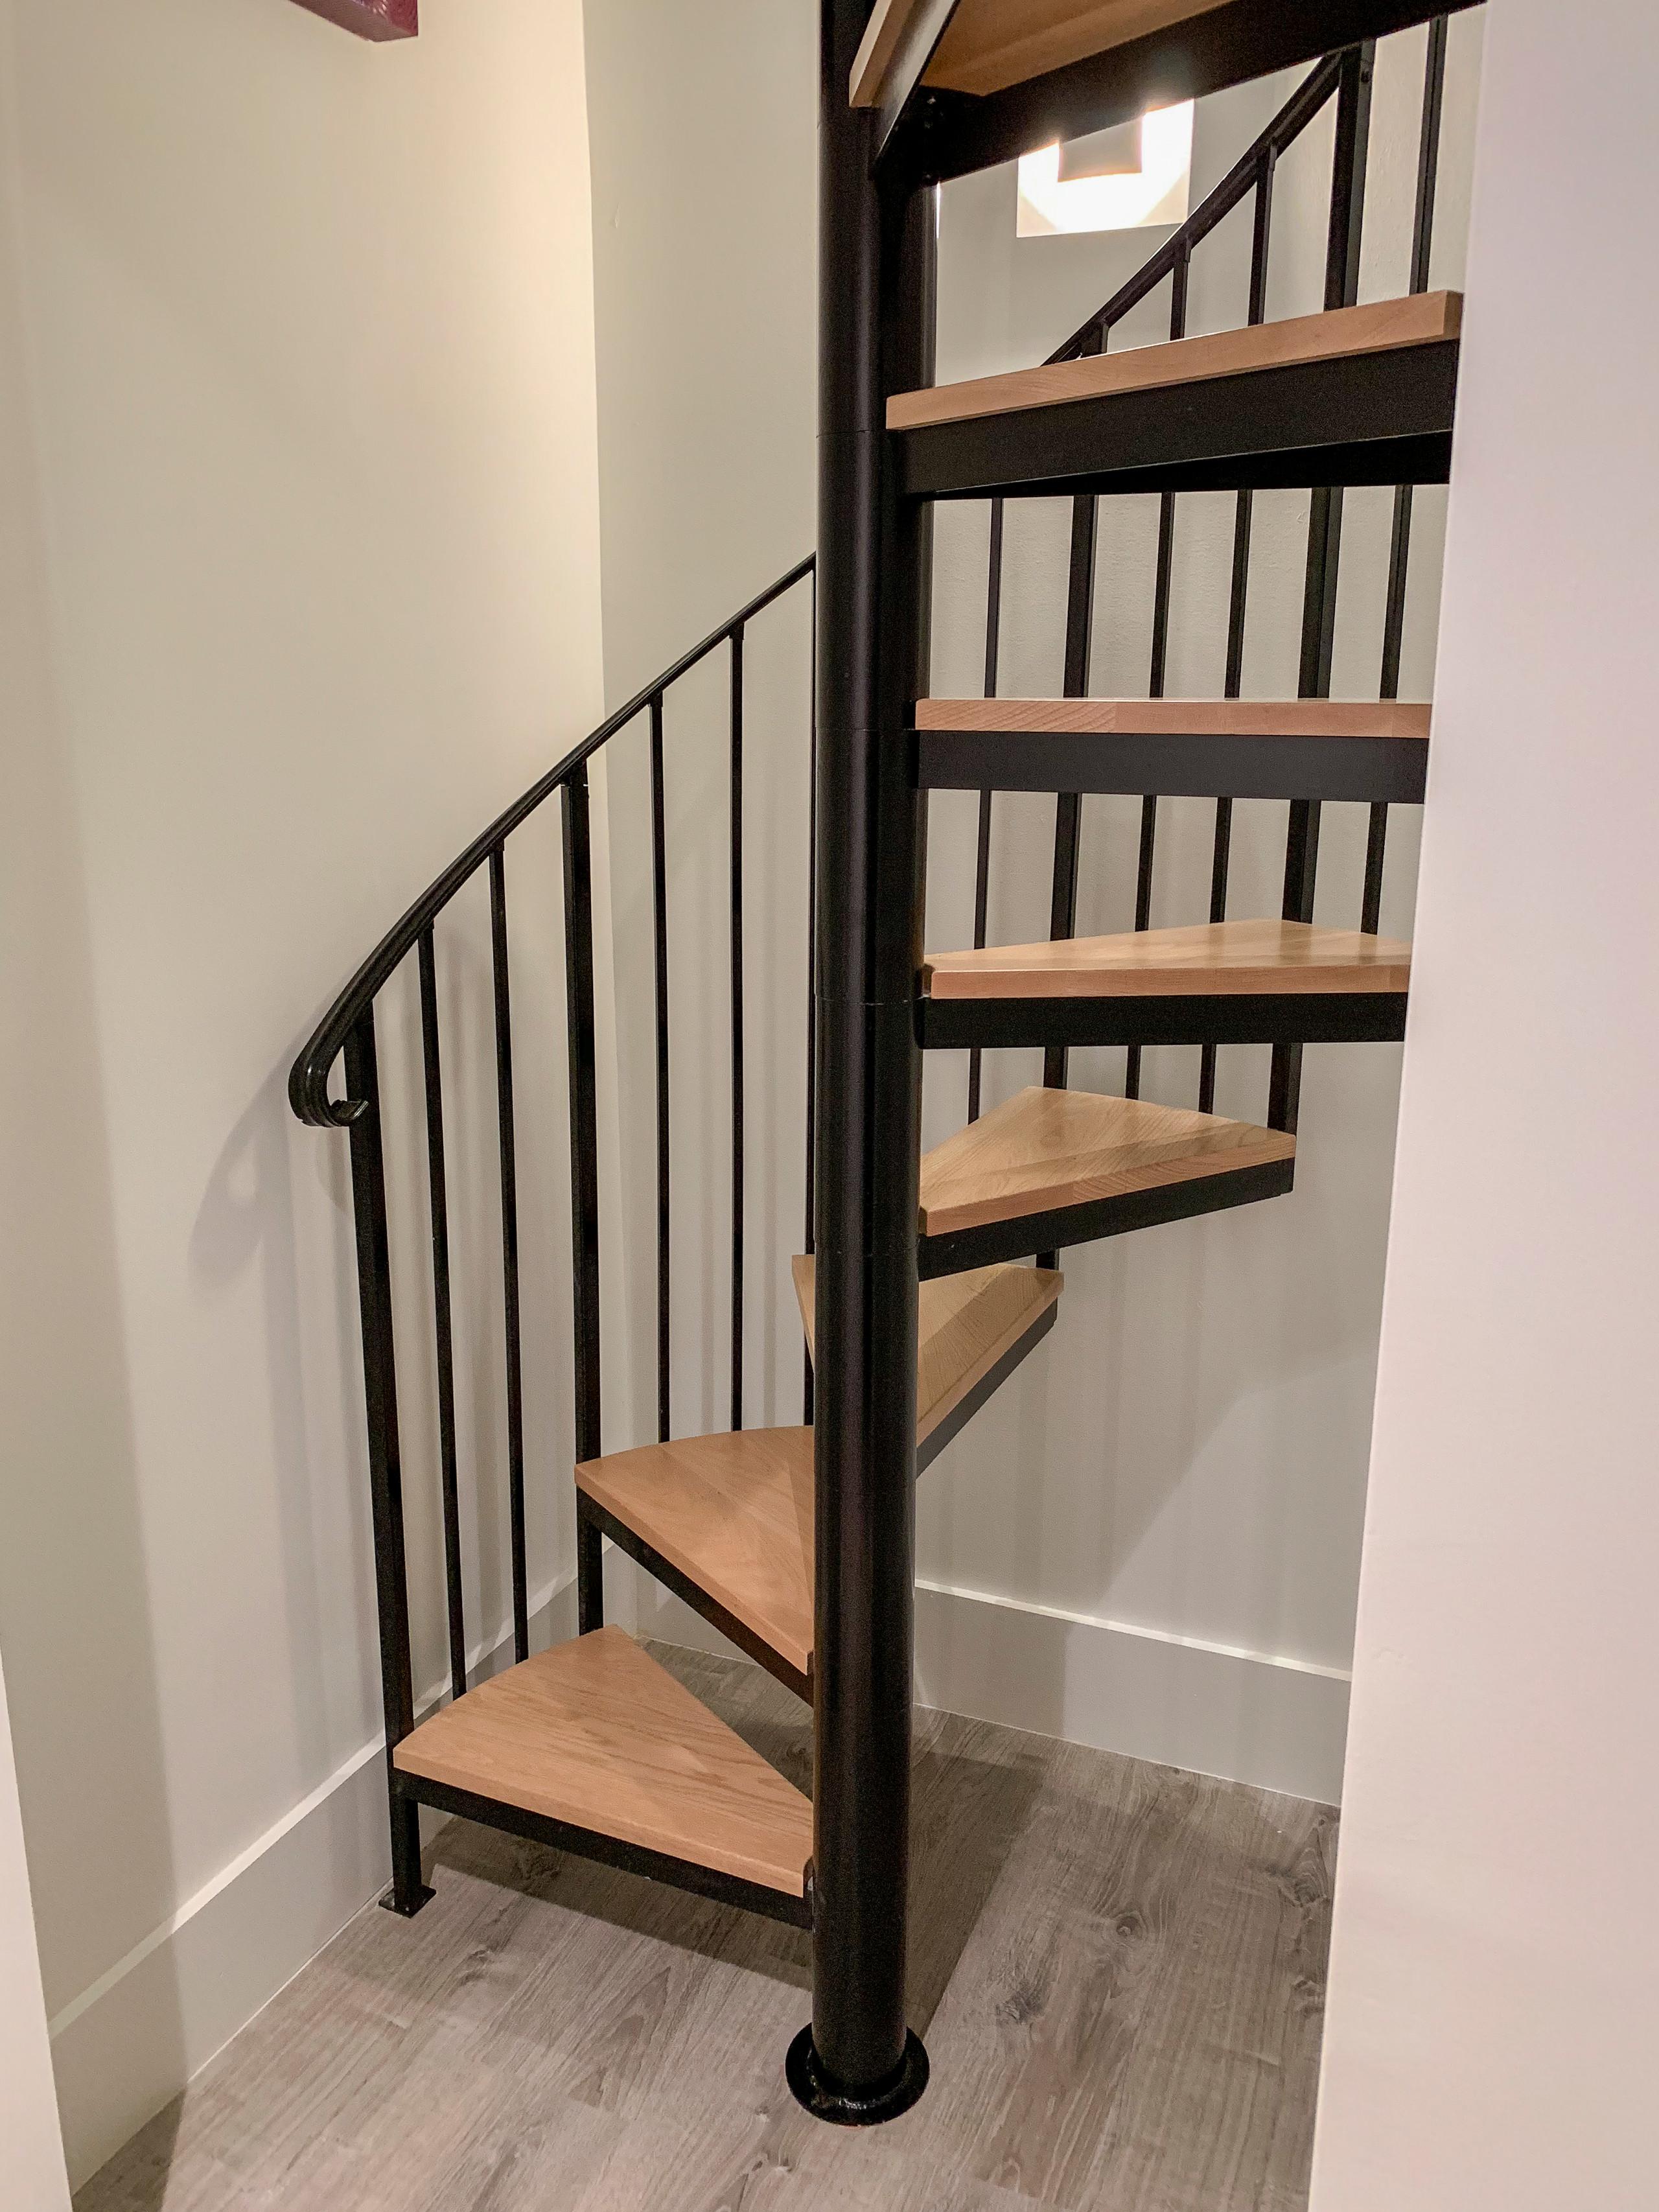 62_Natural Wood Treads & Jet-Black Metal Custom Spiral Stairway, Bethesda MD 208